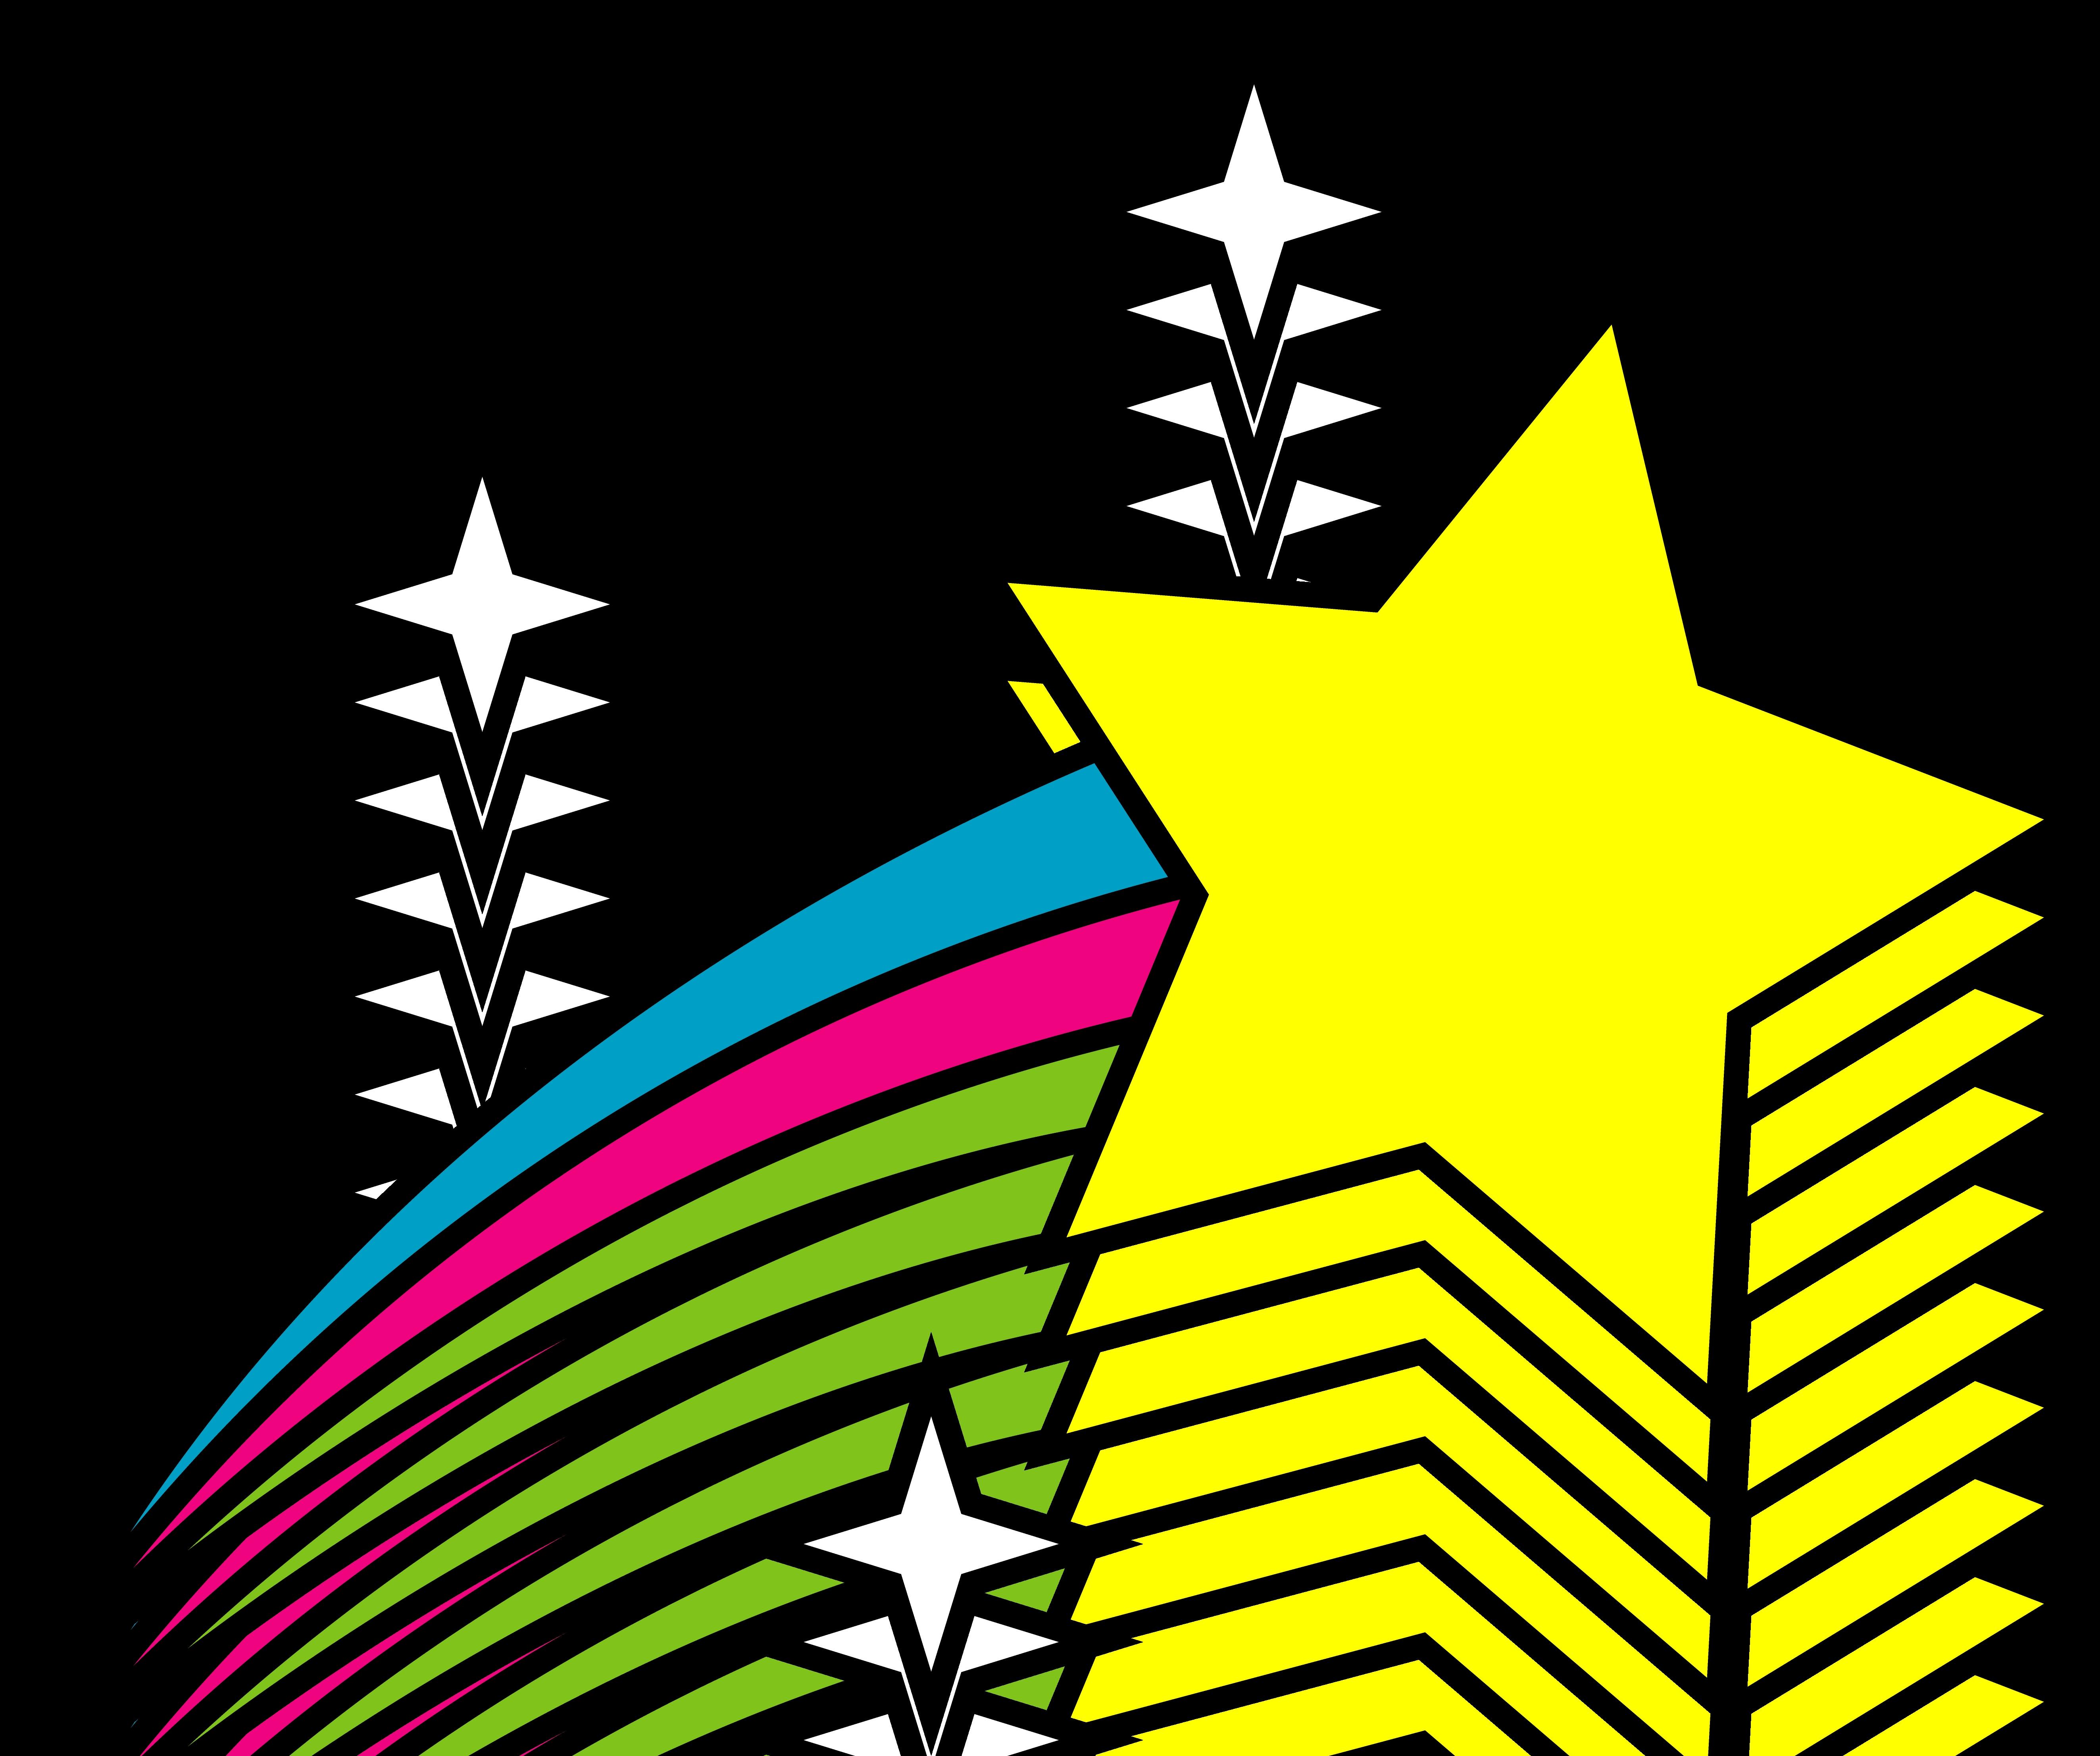 5292x4424 New Star Clipart Design